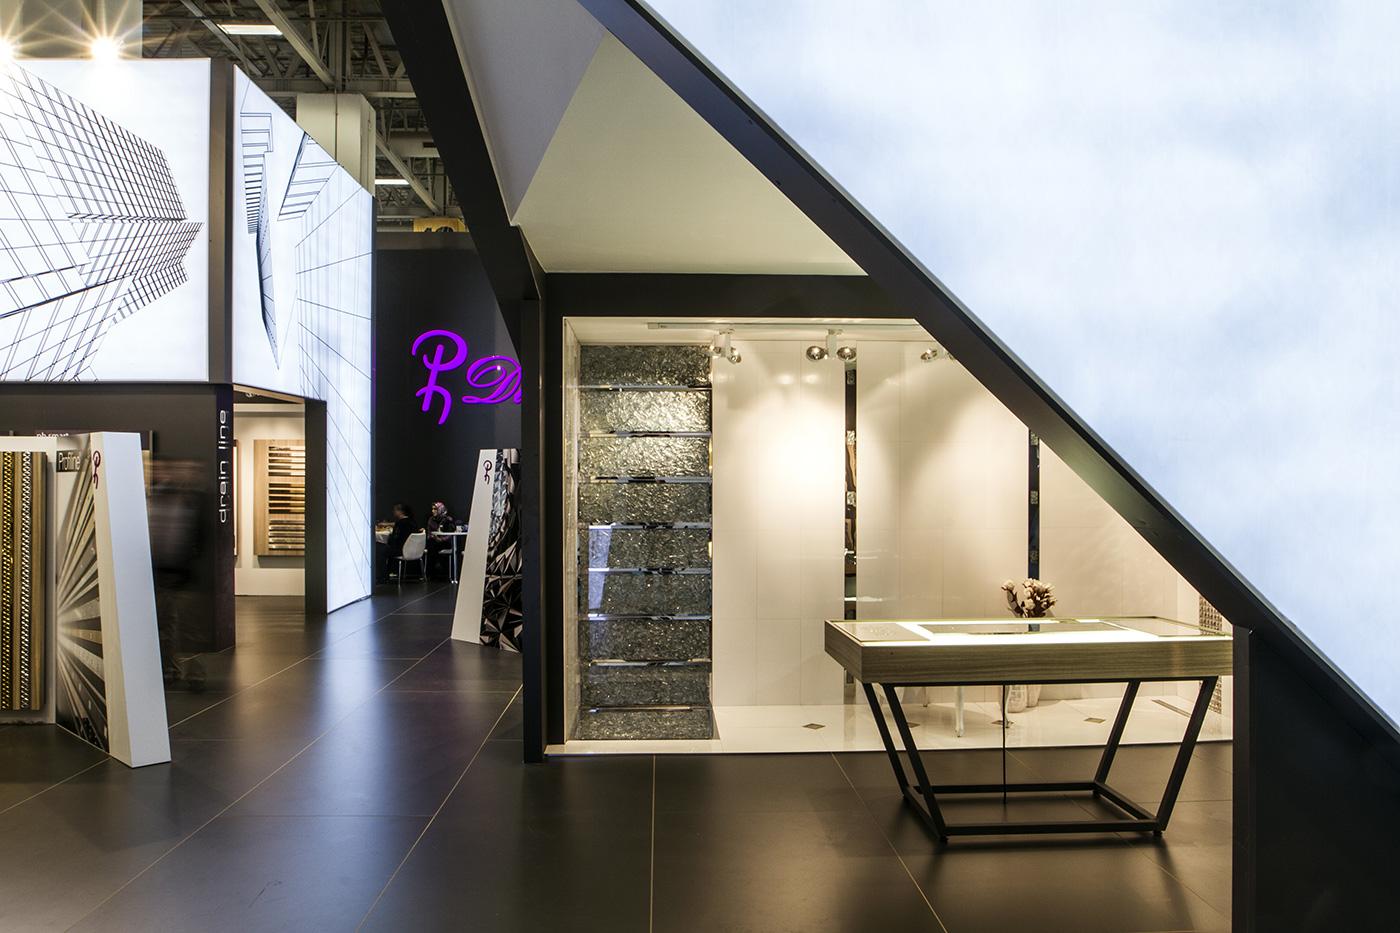 Design office fuar tasarimi ph unicera 2015 22 design for Office design 2015